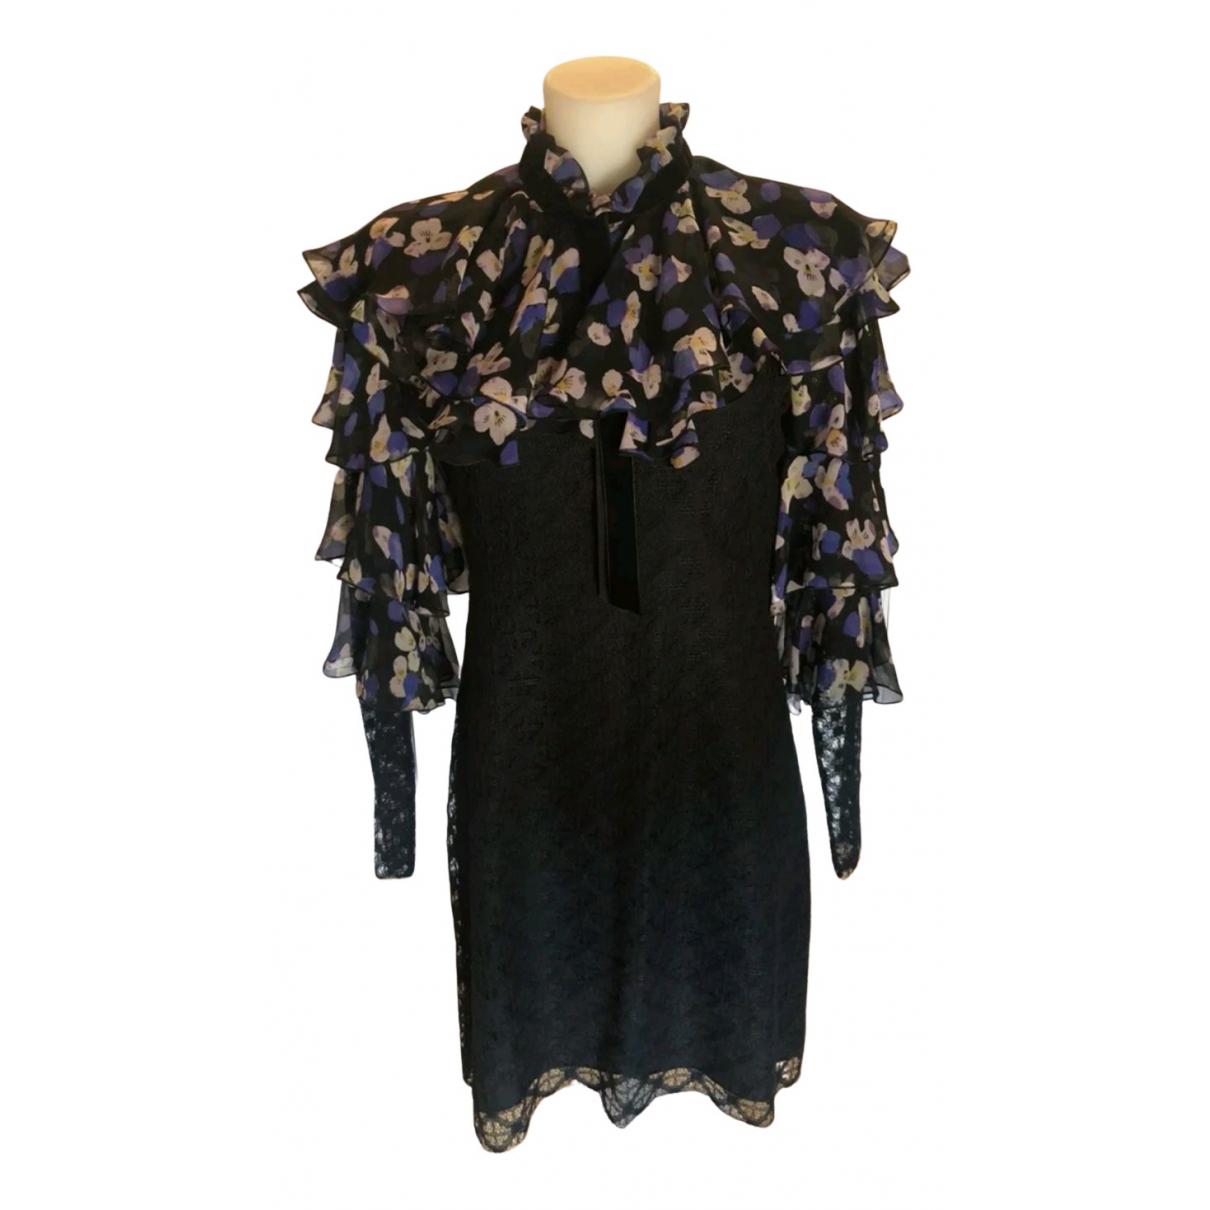 Philosophy Di Lorenzo Serafini N Multicolour Cotton dress for Women 42 IT